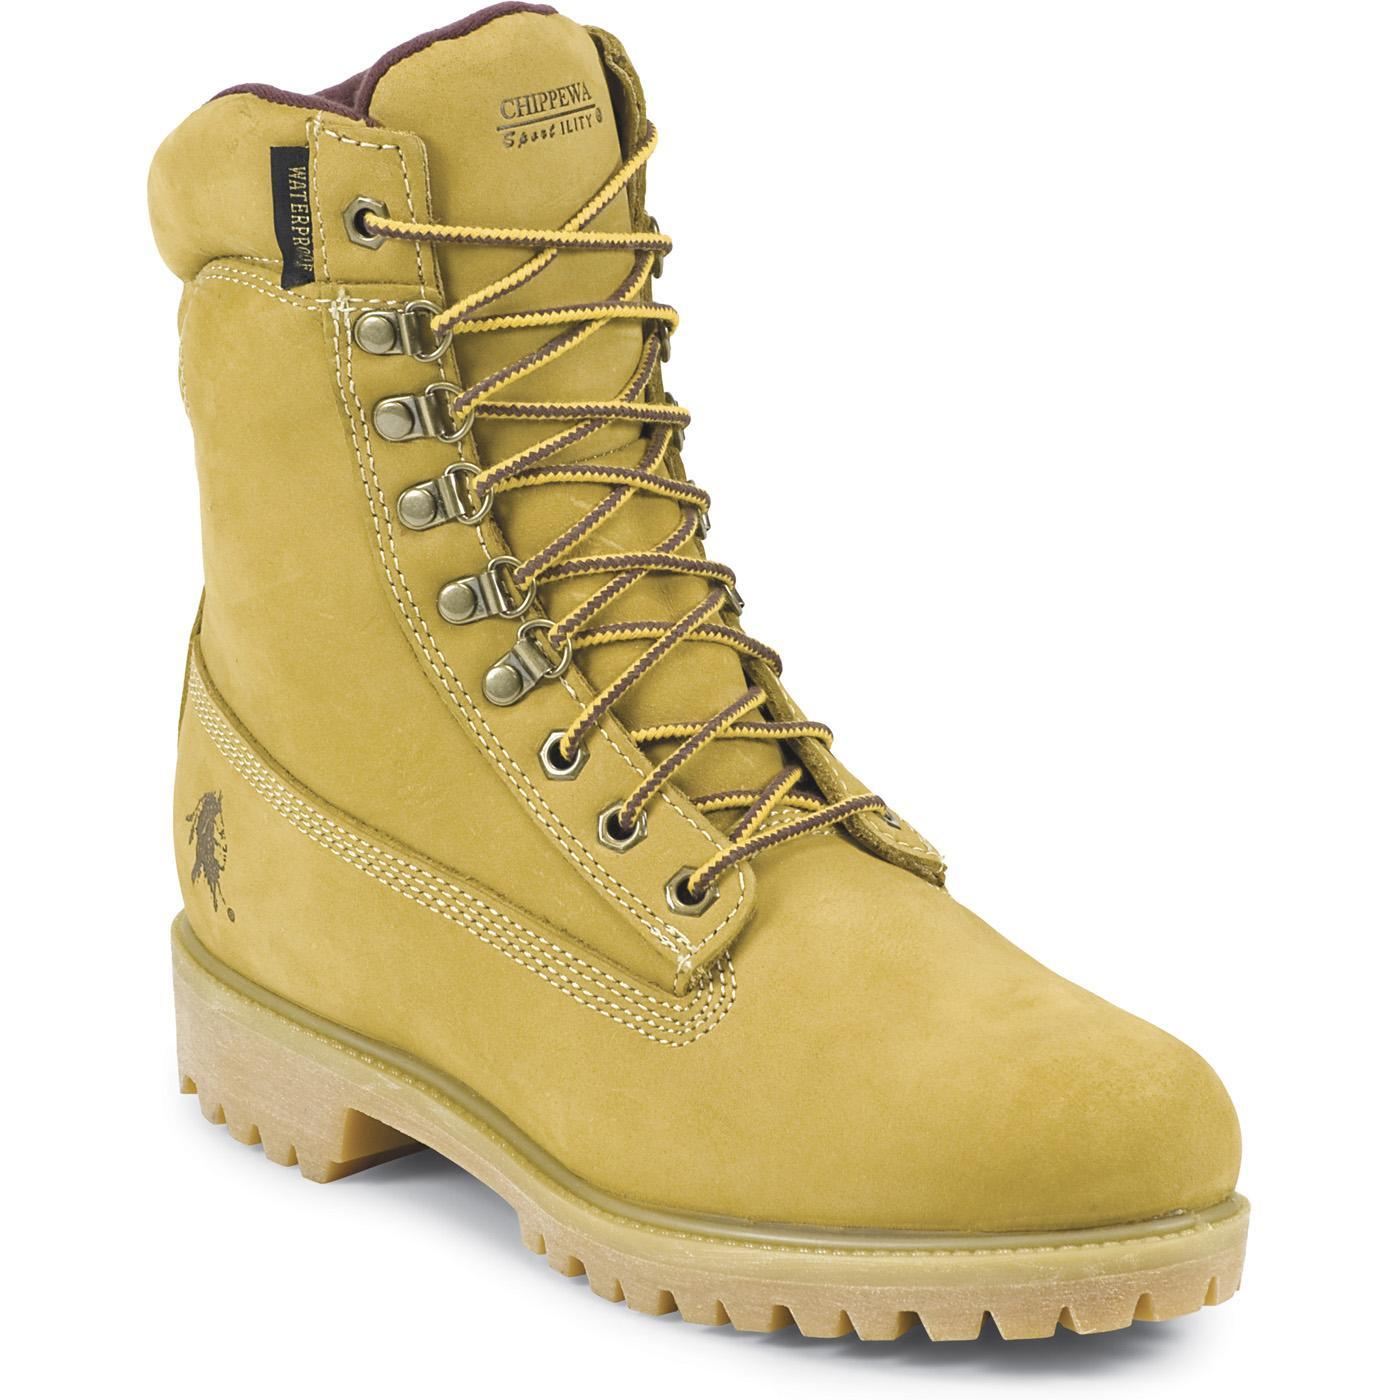 baa0b660dffa Chippewa Waterproof Insulated Work Boot